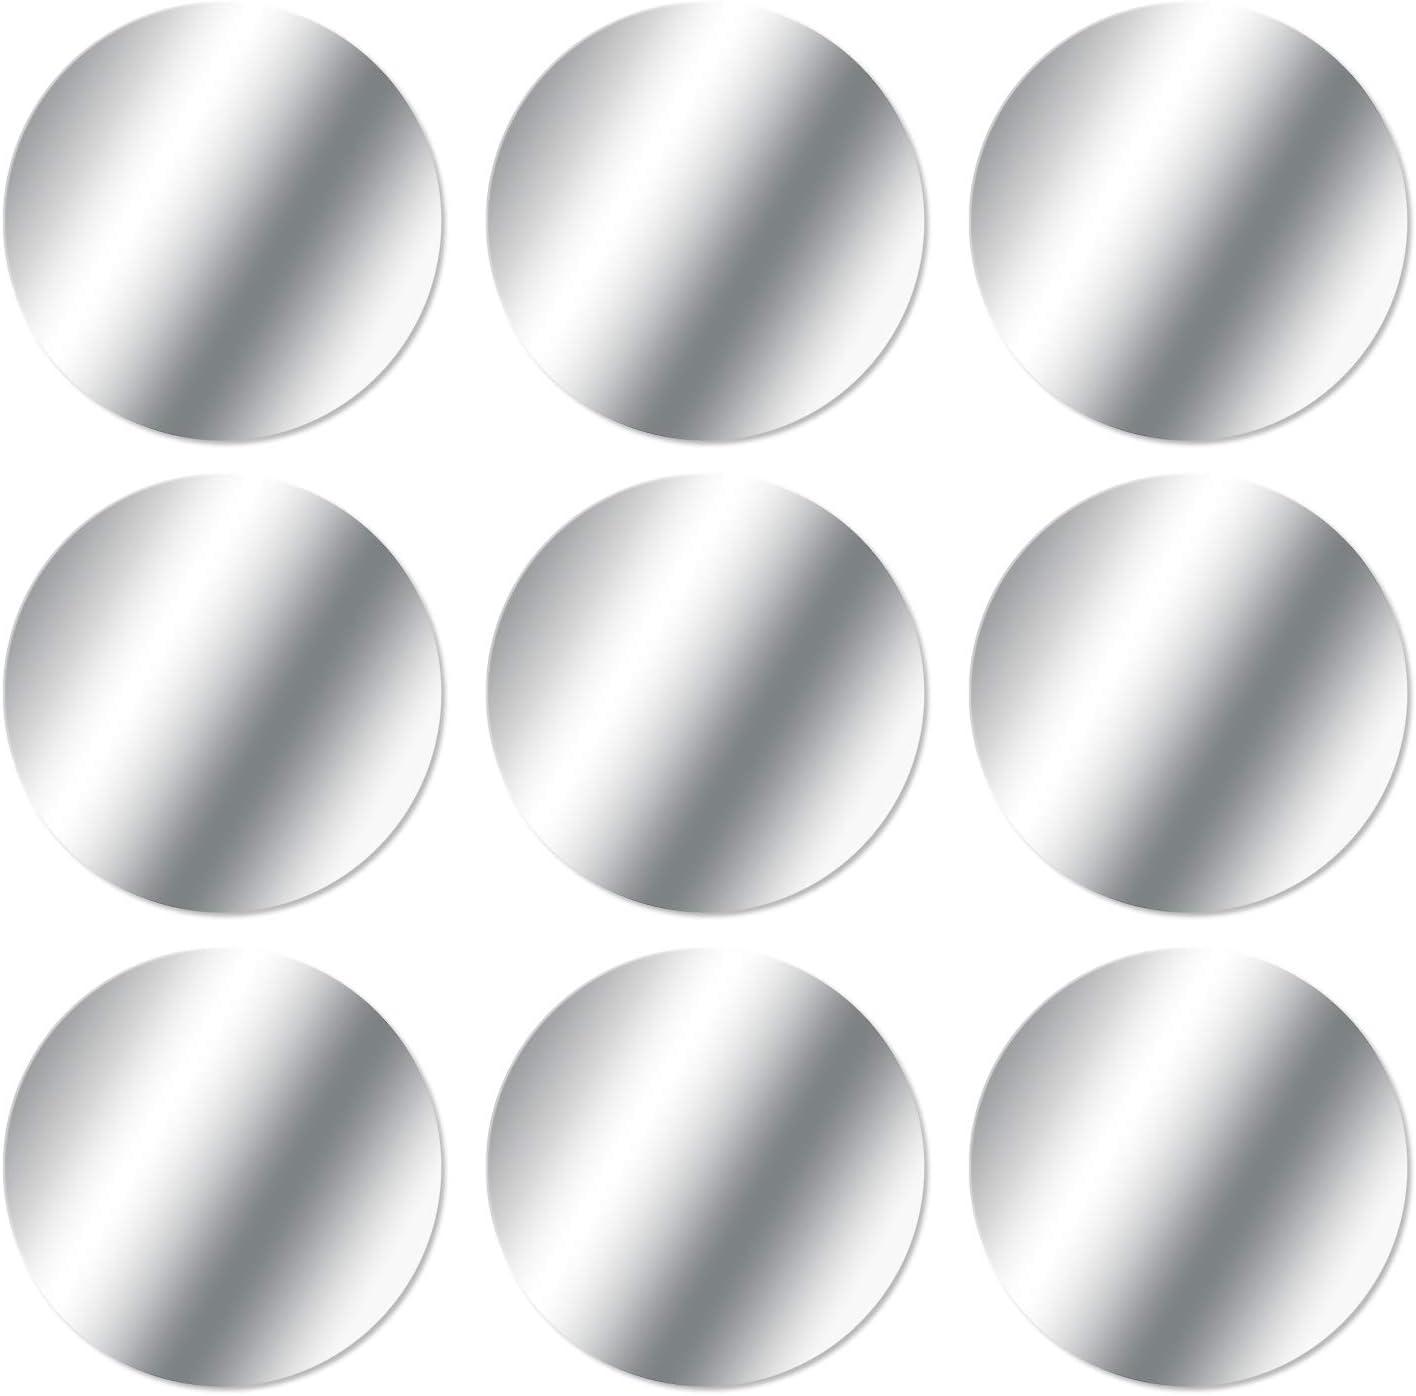 Mosuo 9 Stück Metallplatte Metallplättchen Amazon De Elektronik